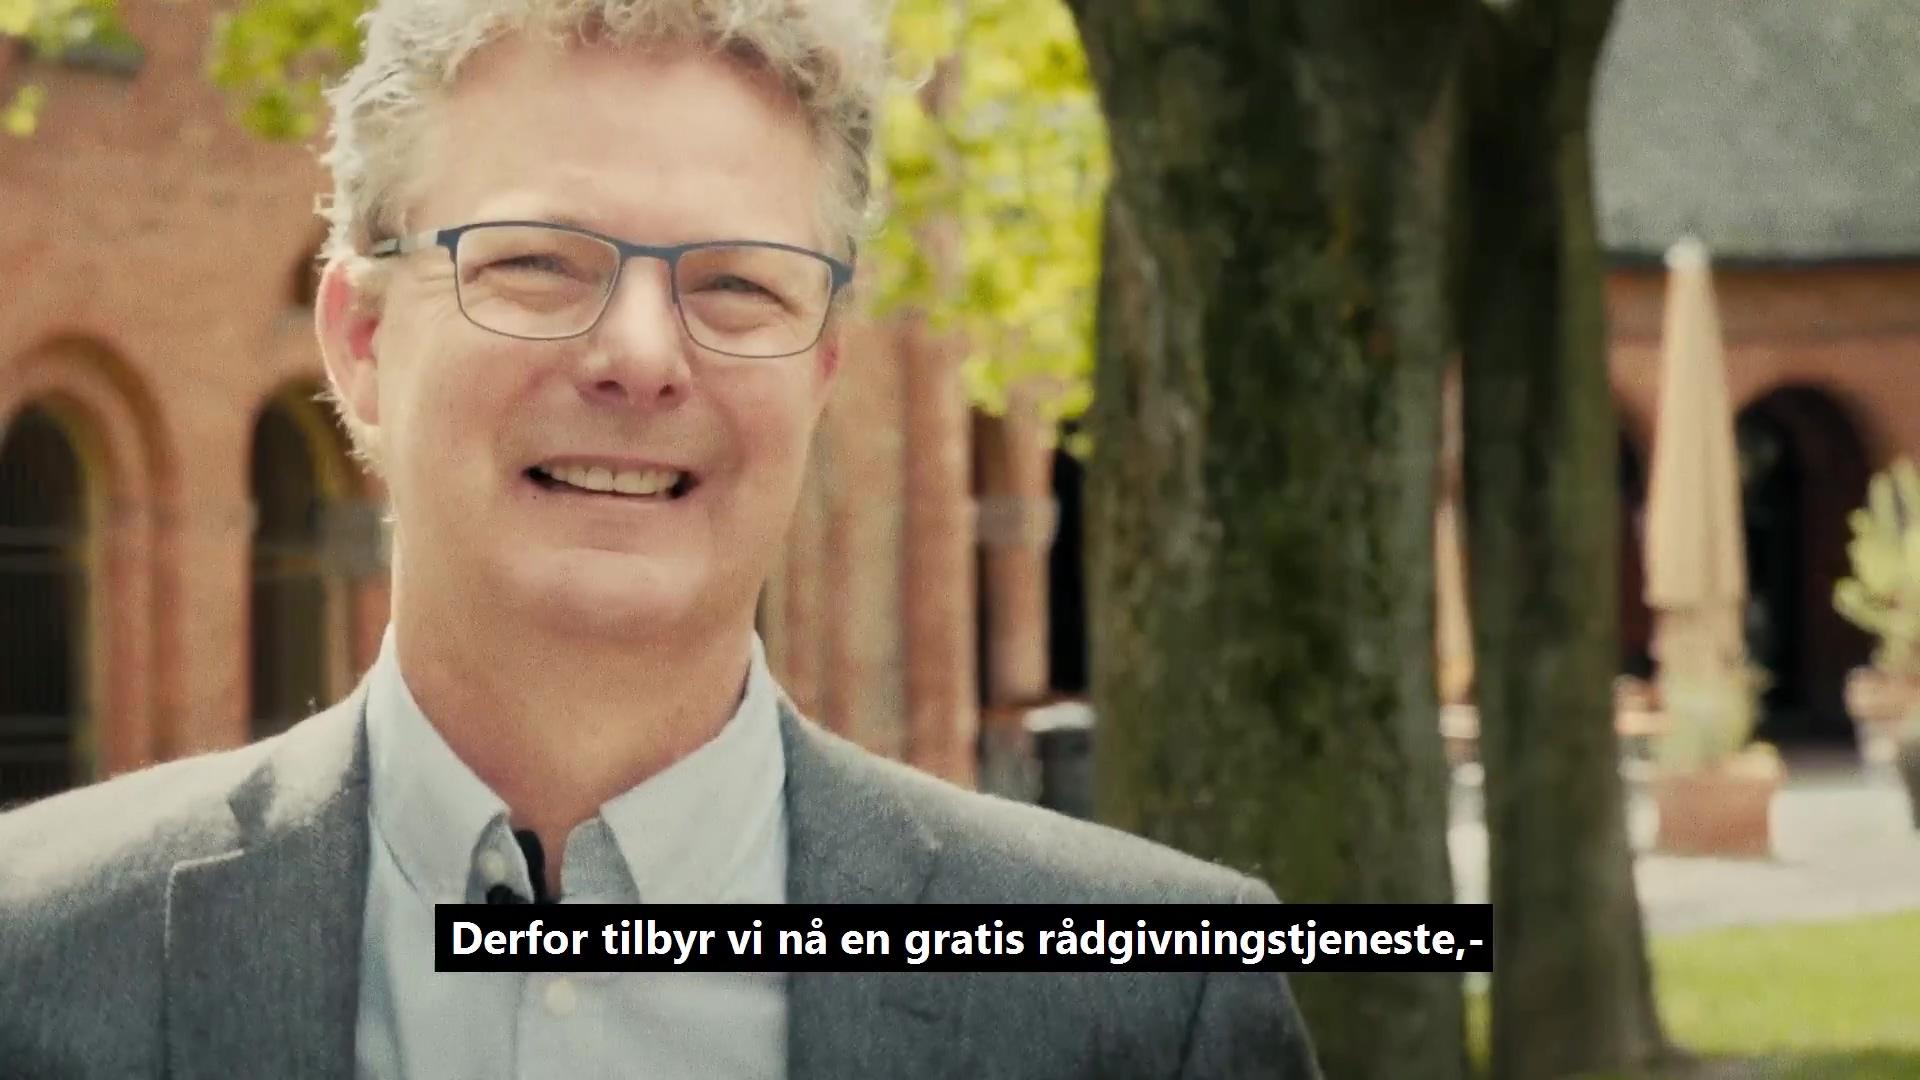 COMMUNICATE_Radgivningskampanje_Film1_V02_NO